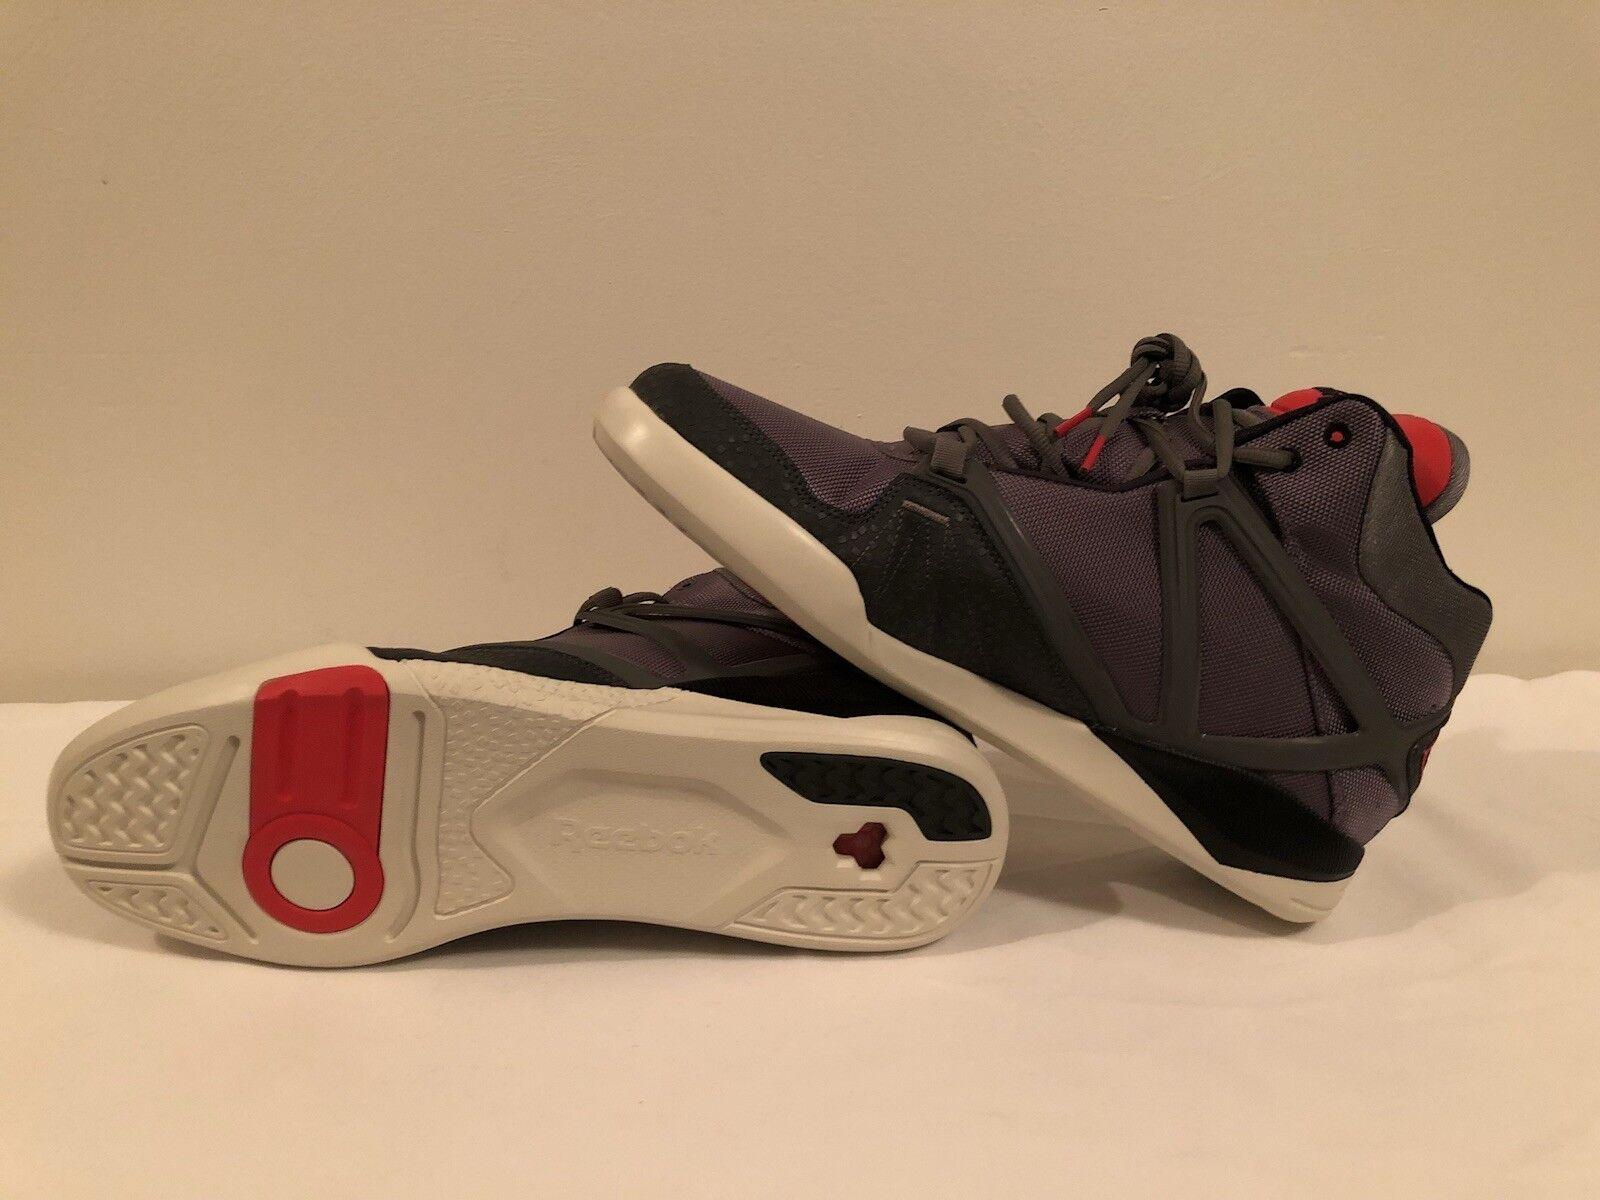 Men's Reebok Pump Omni Lite Grey/Red/Black Size 13 New & Real